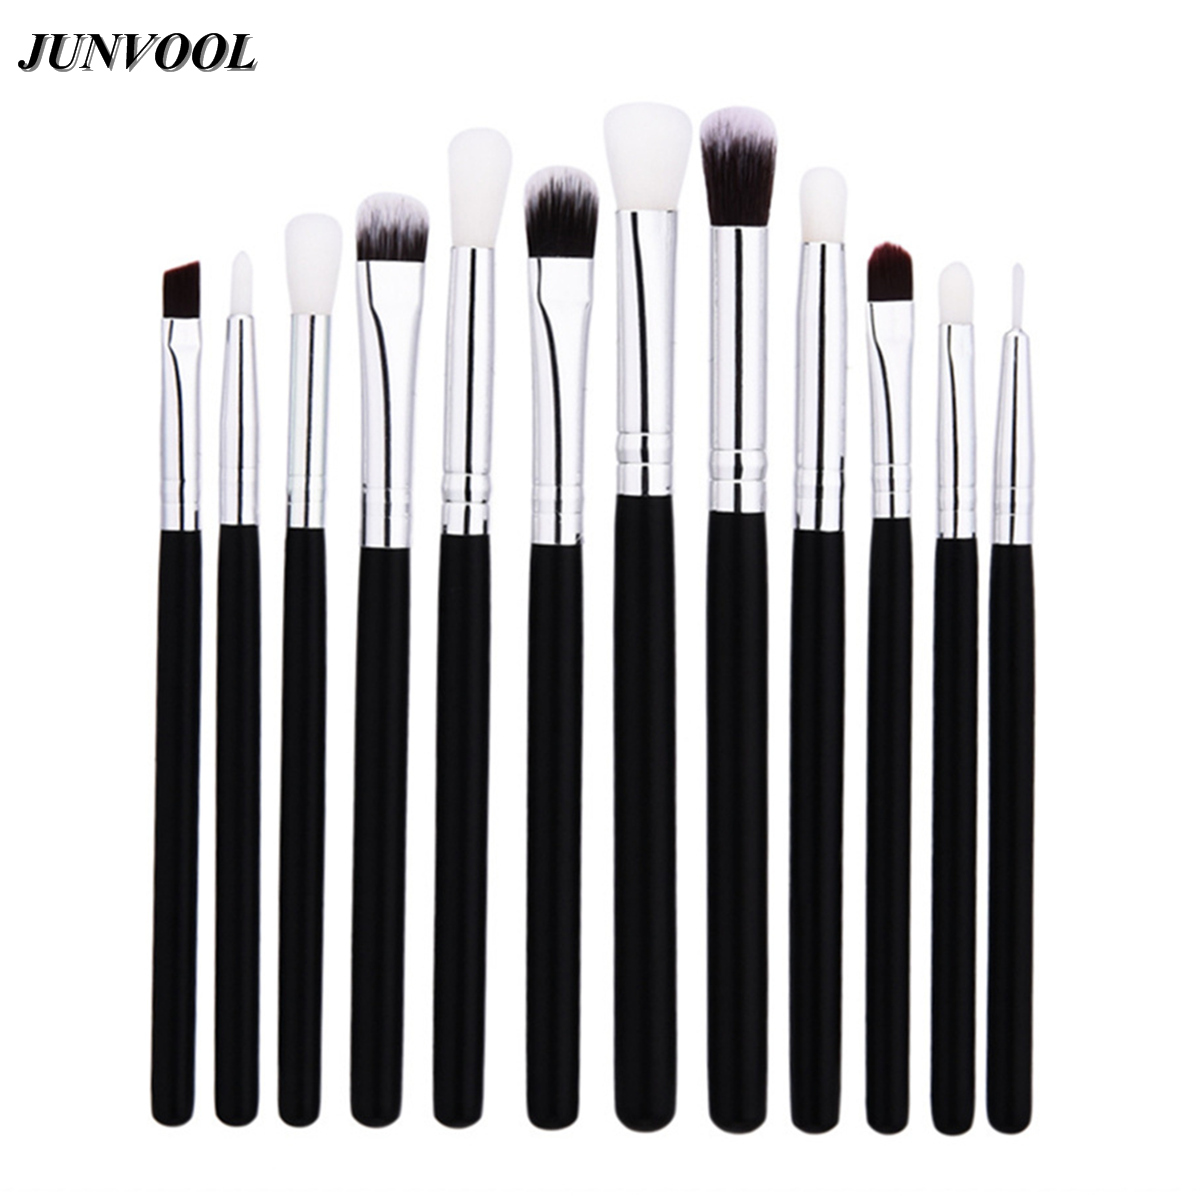 12Pcs Eye Makeup Brushes Set Professional Black Silver Cosmetics Eyeliner Eyeshadow Make Up Tools Beauty Pencil Brush Kits 22pcs black makeup brushes set eyeshadow